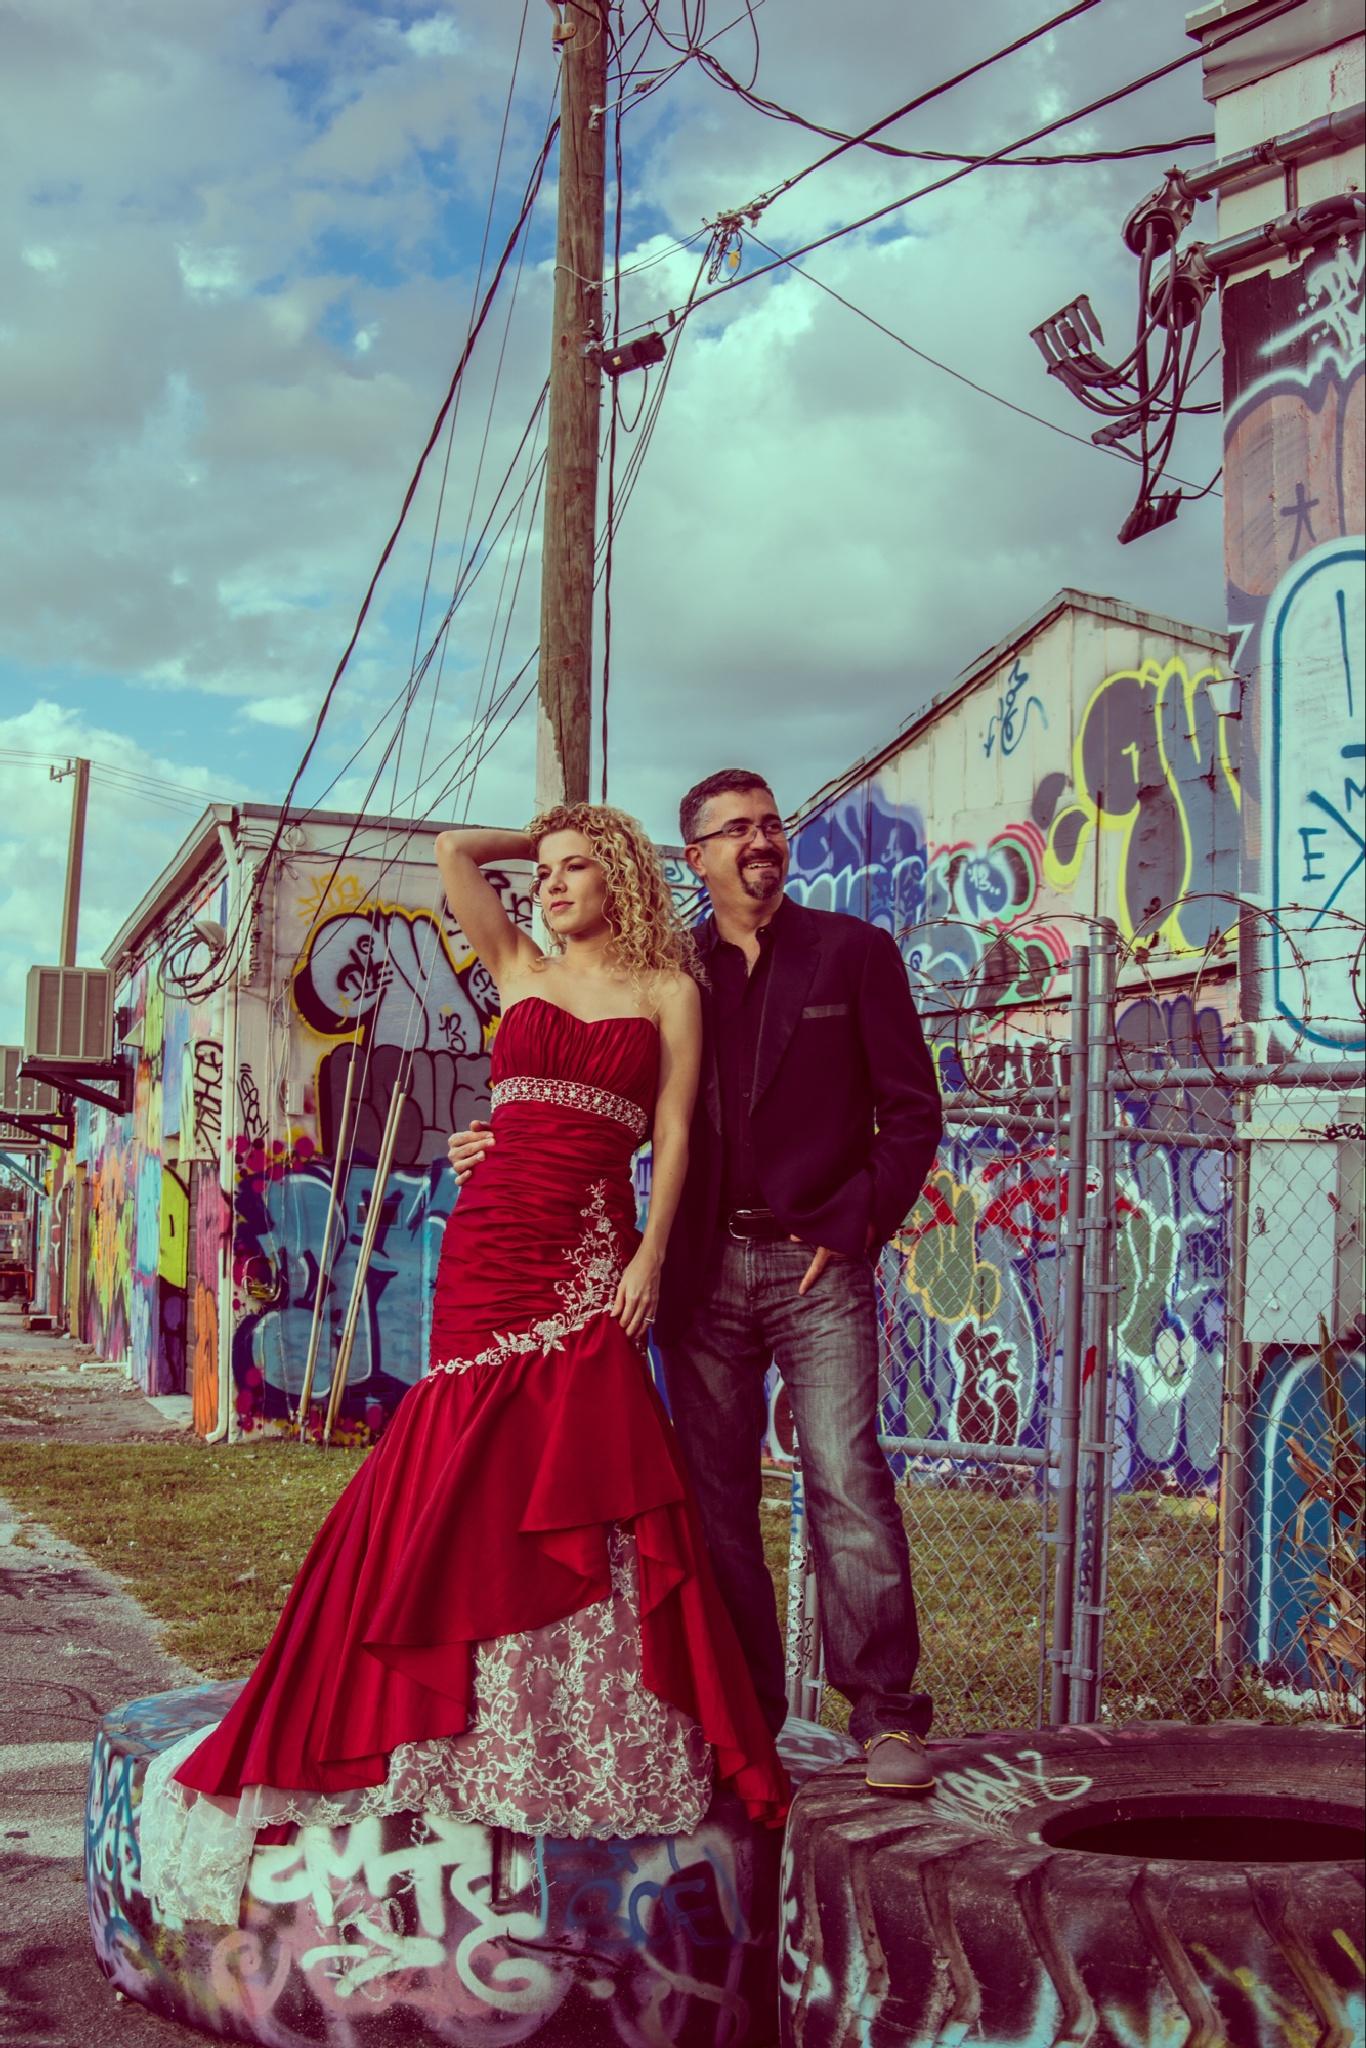 Fashionable couple by lifesatriphotography